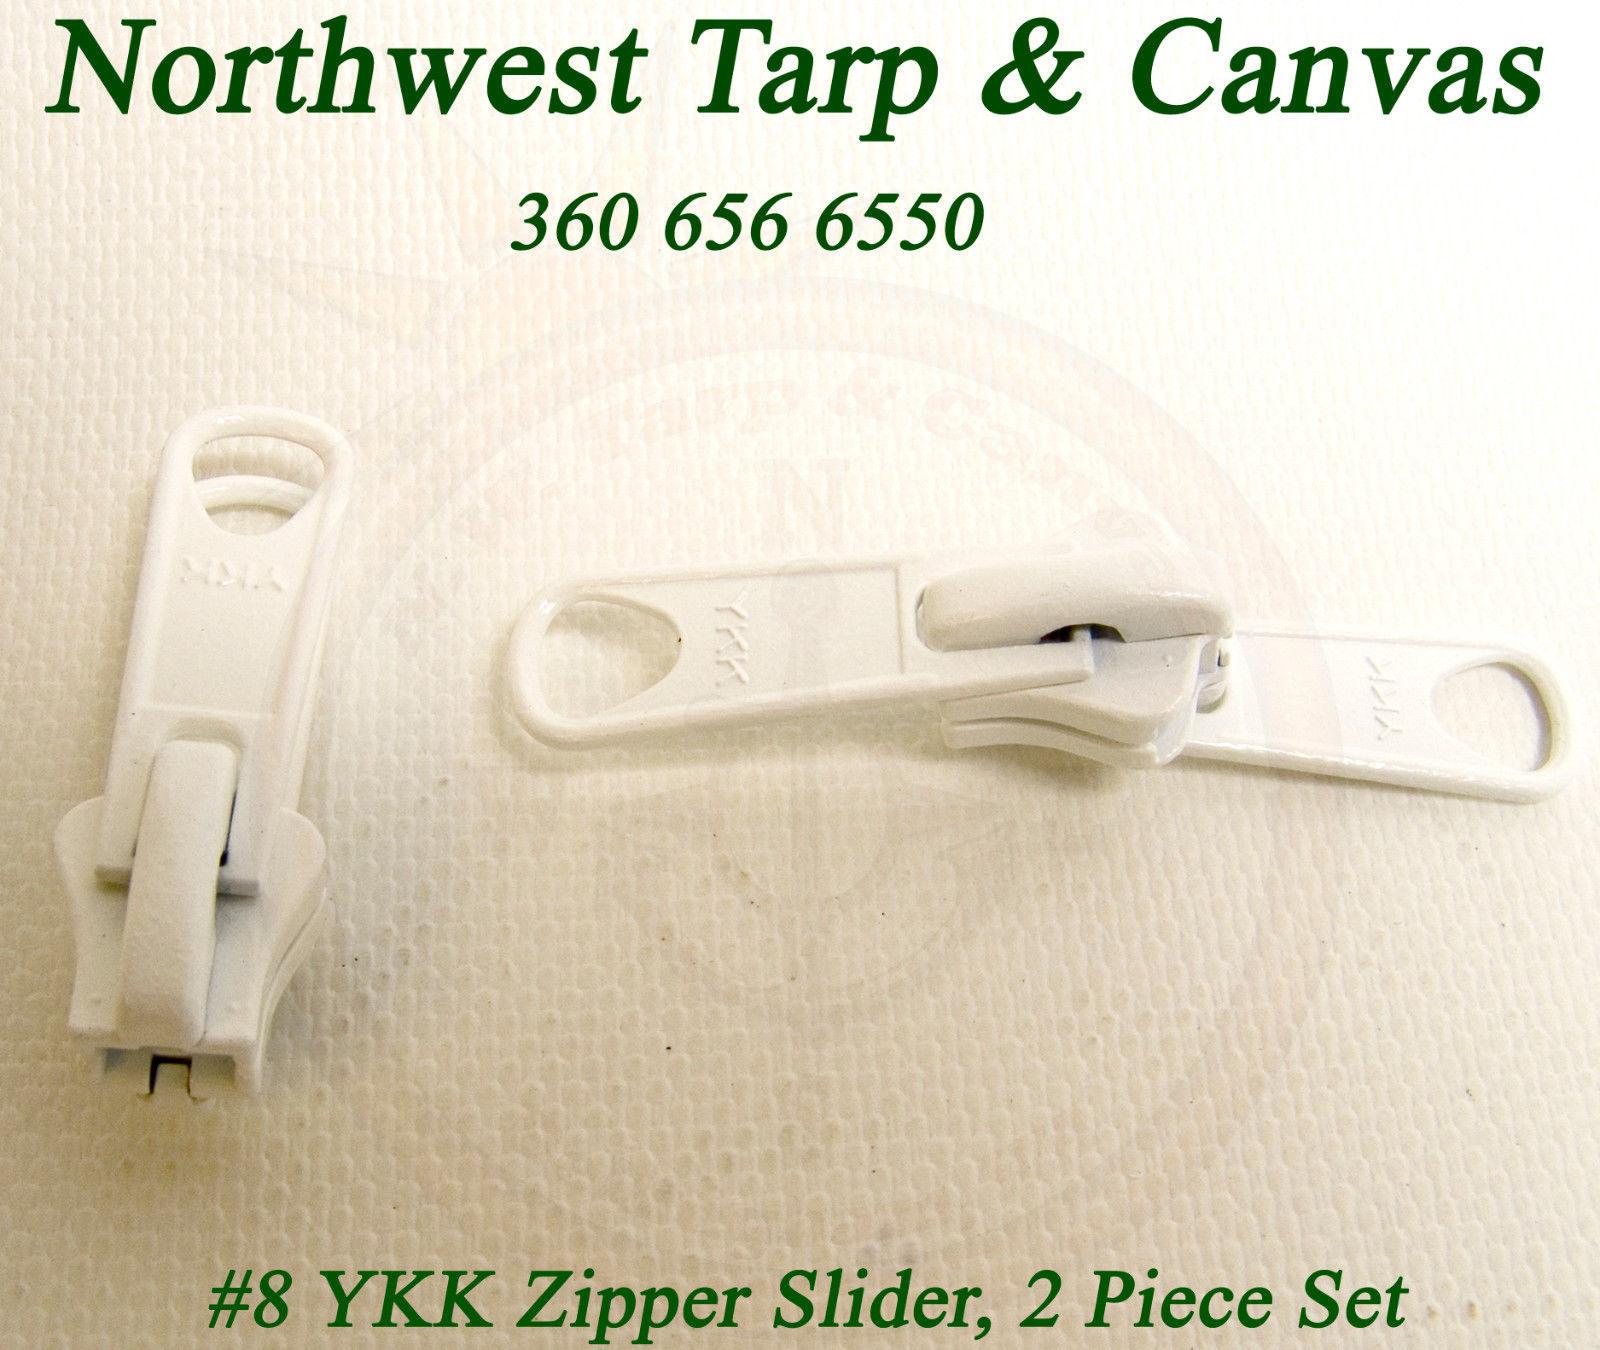 Zipper Slider, YKK Vislon, Double Metal Pull Tab, #8, White, 2 Pc. image 3